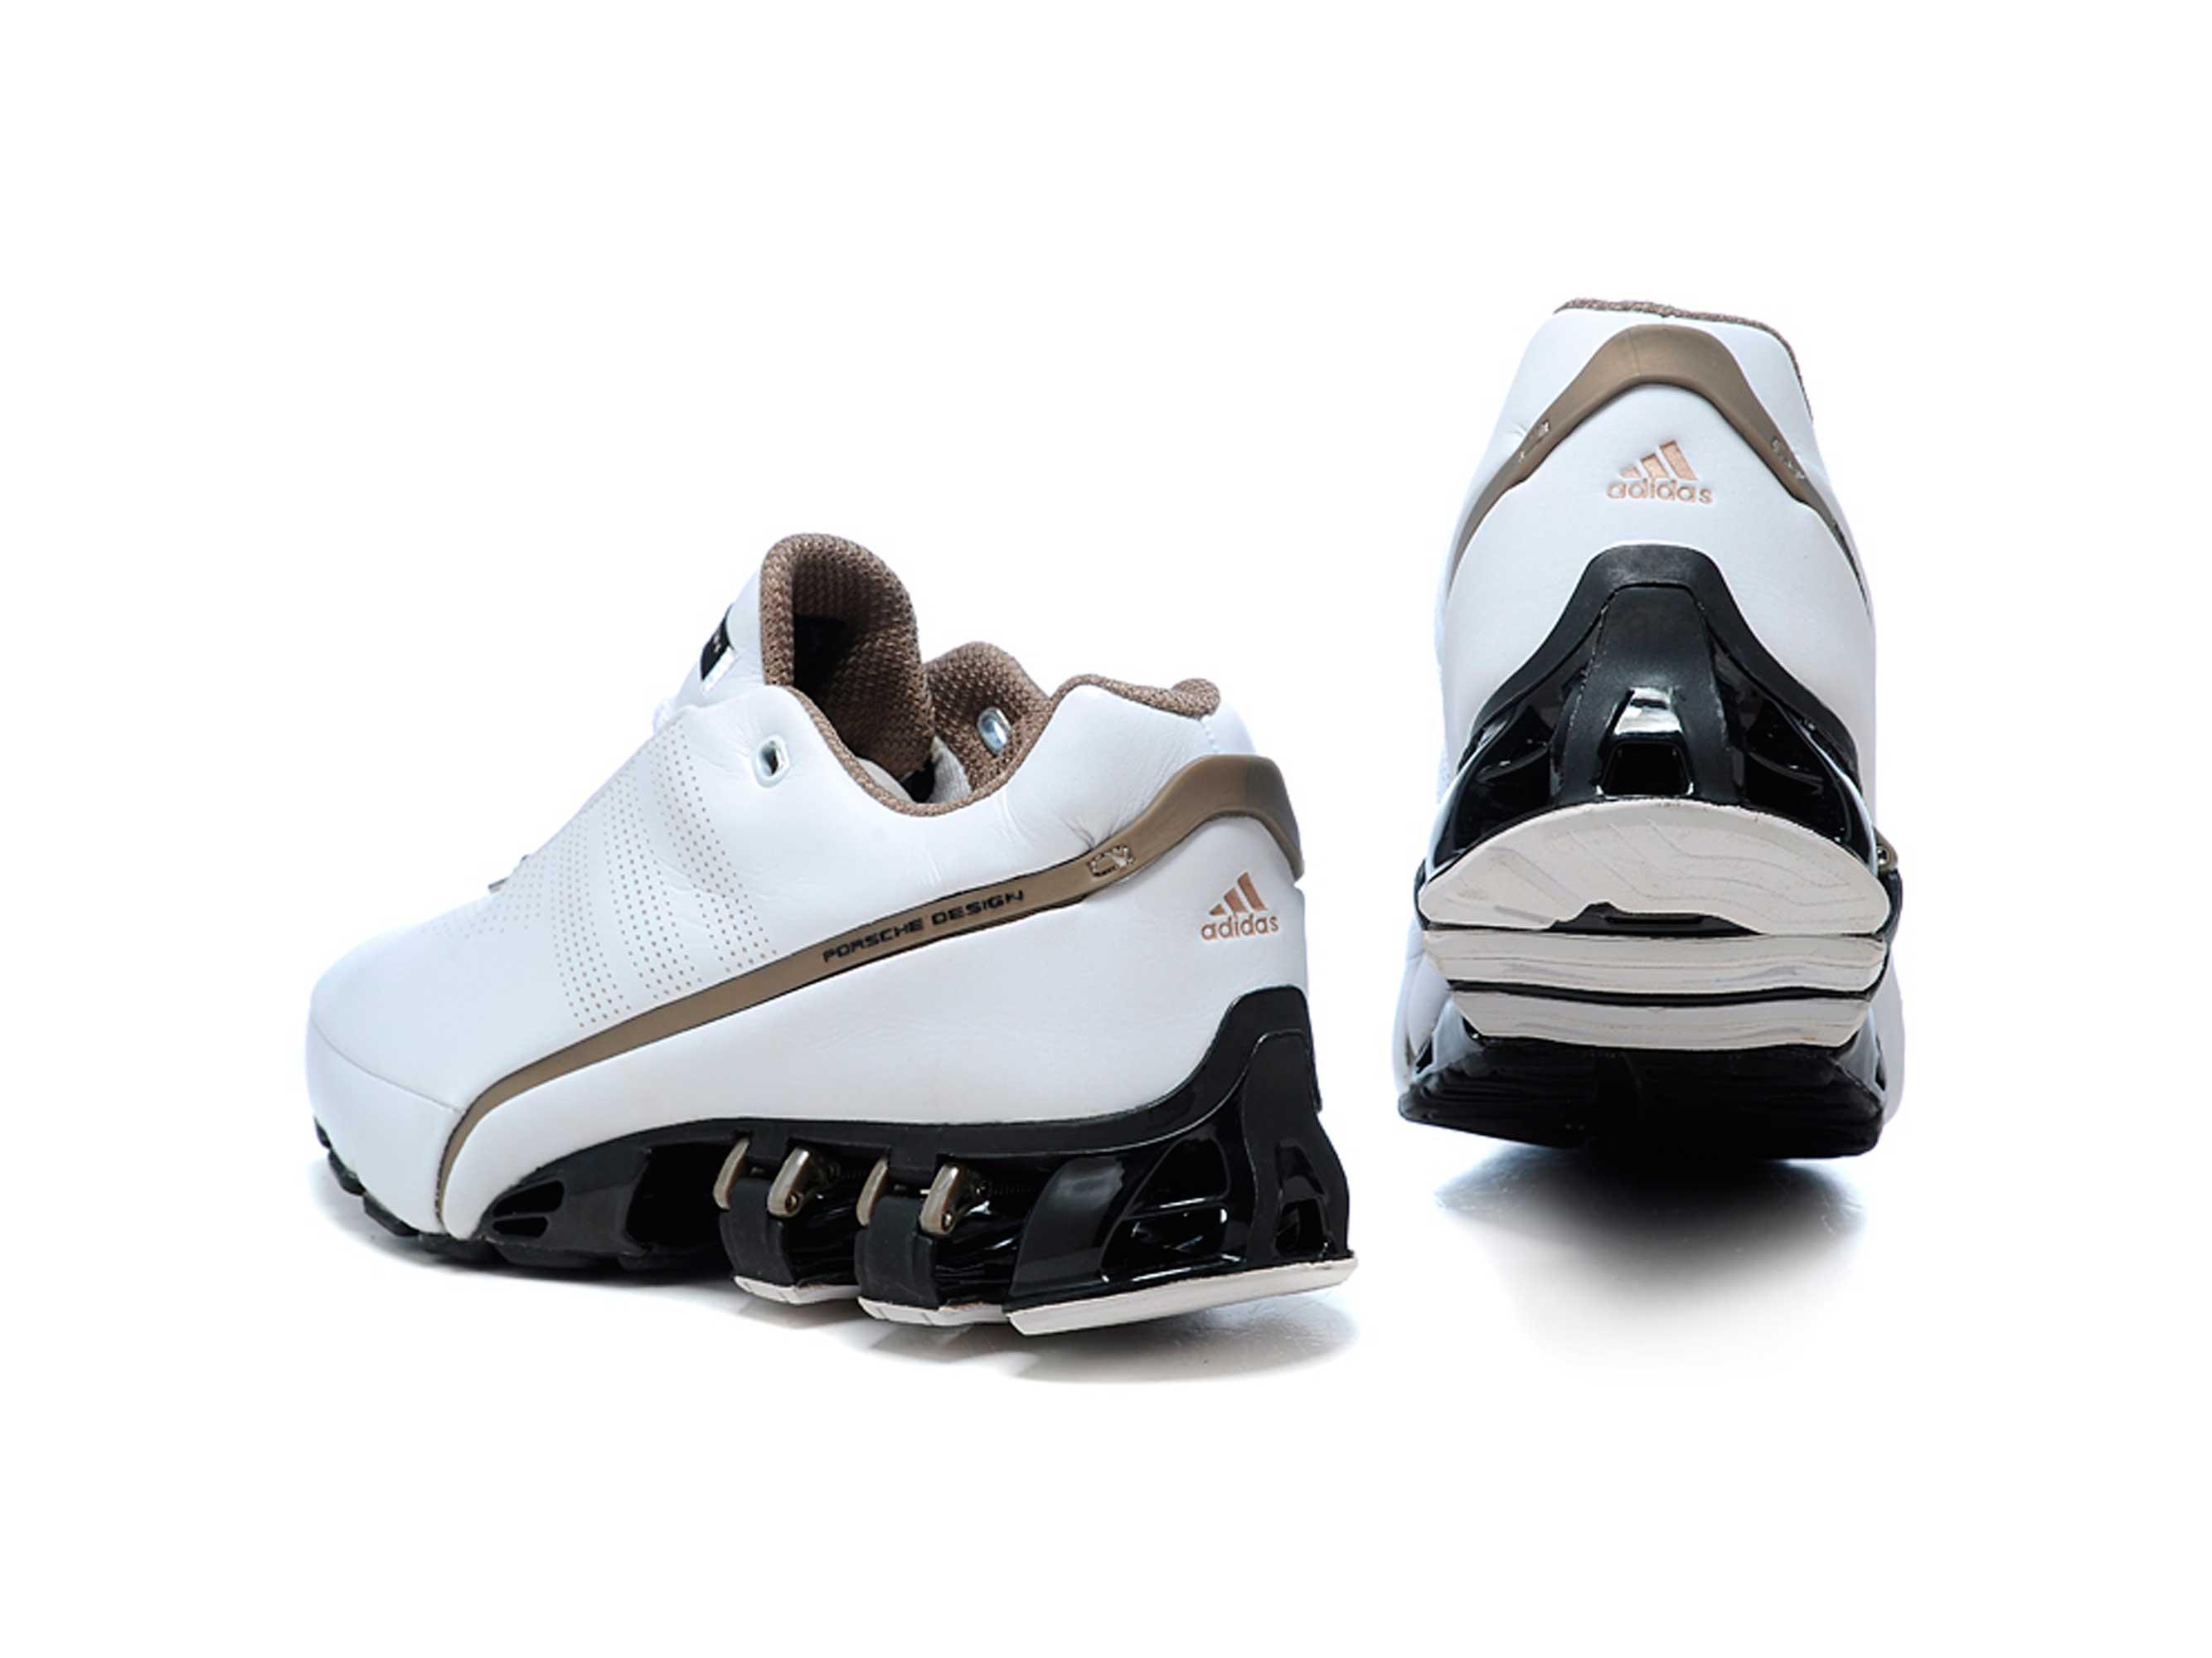 0d33d6121 adidas porsche design sport bounce P 5000 s2 top quality white gold купить